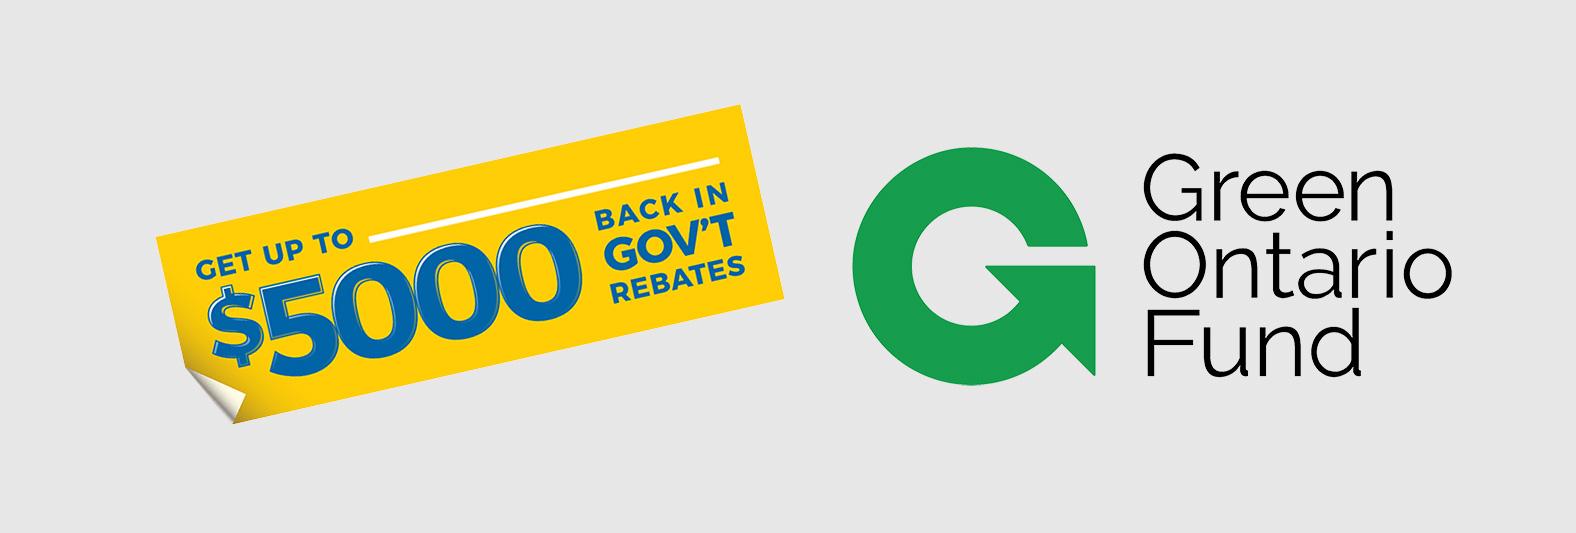 GreenON $5,000 Rebate Program